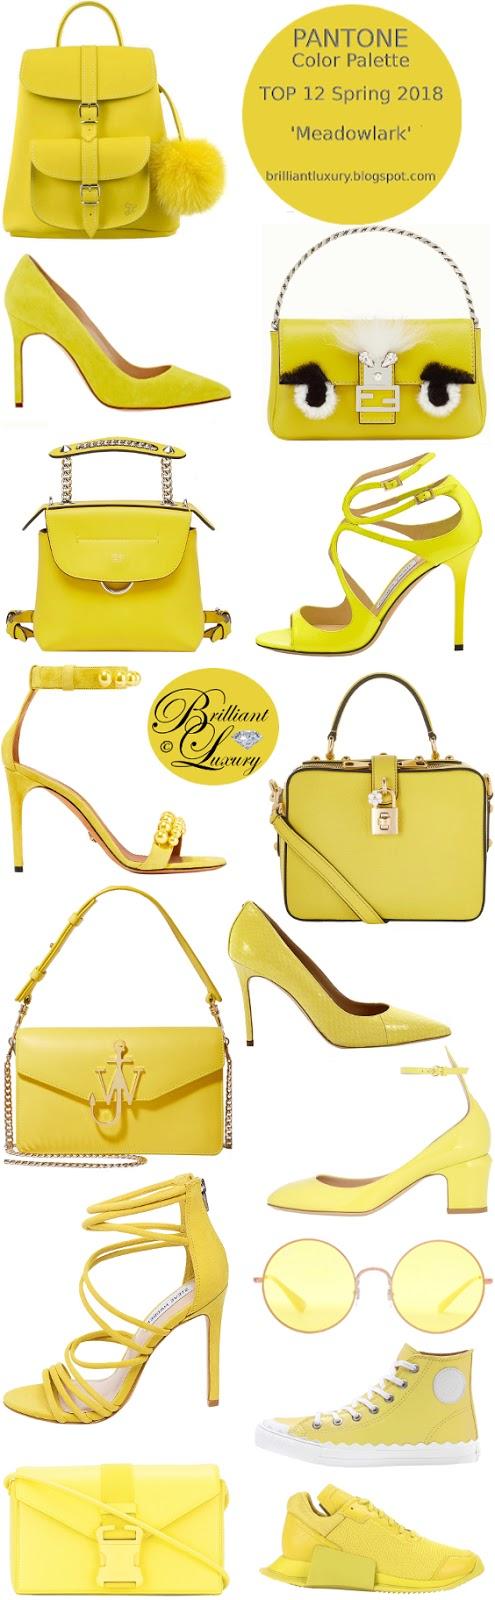 Brilliant Luxury ♦ Pantone Spring 2018 Top 12 Color Palette ~ meadowlark